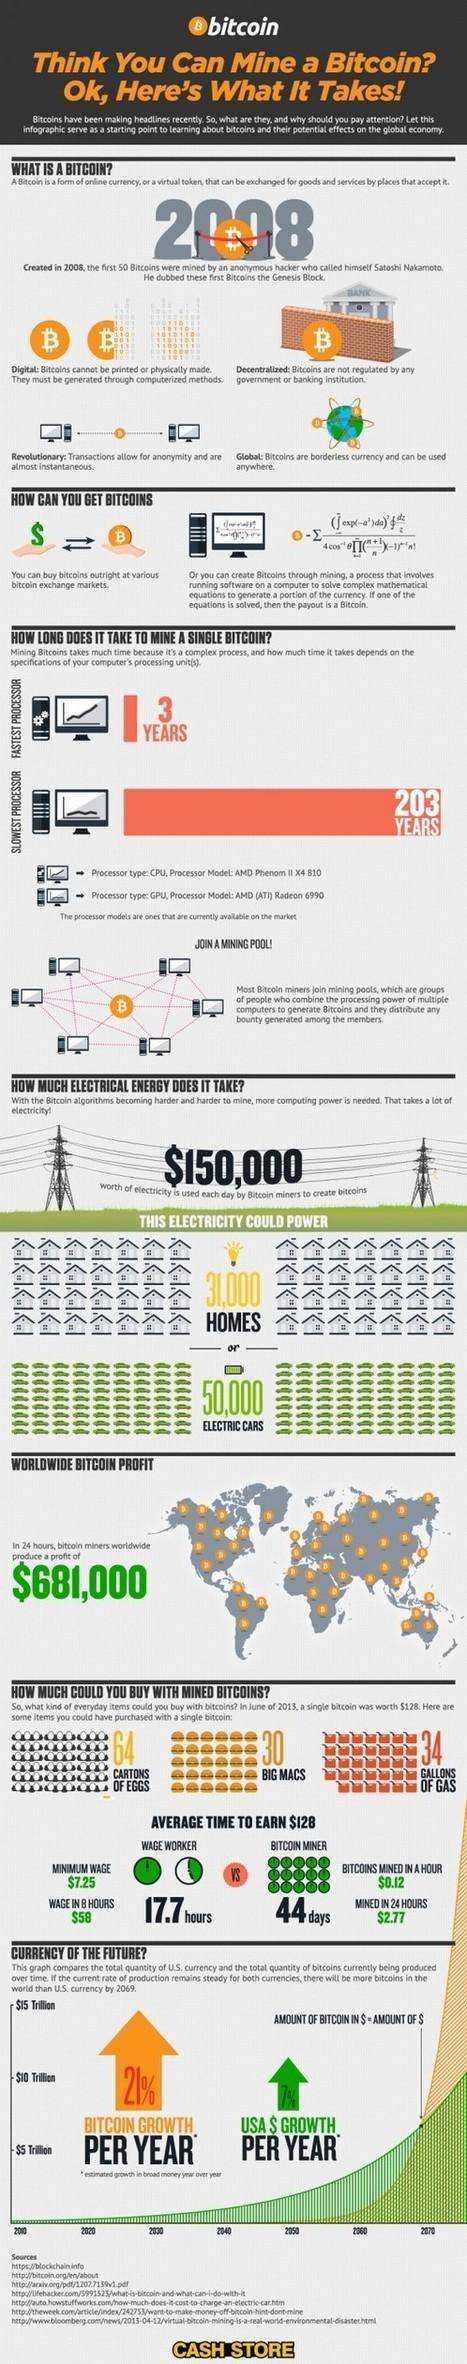 Bitcoin Mining Infographic   Etrade AUSTRALIA   Scoop.it